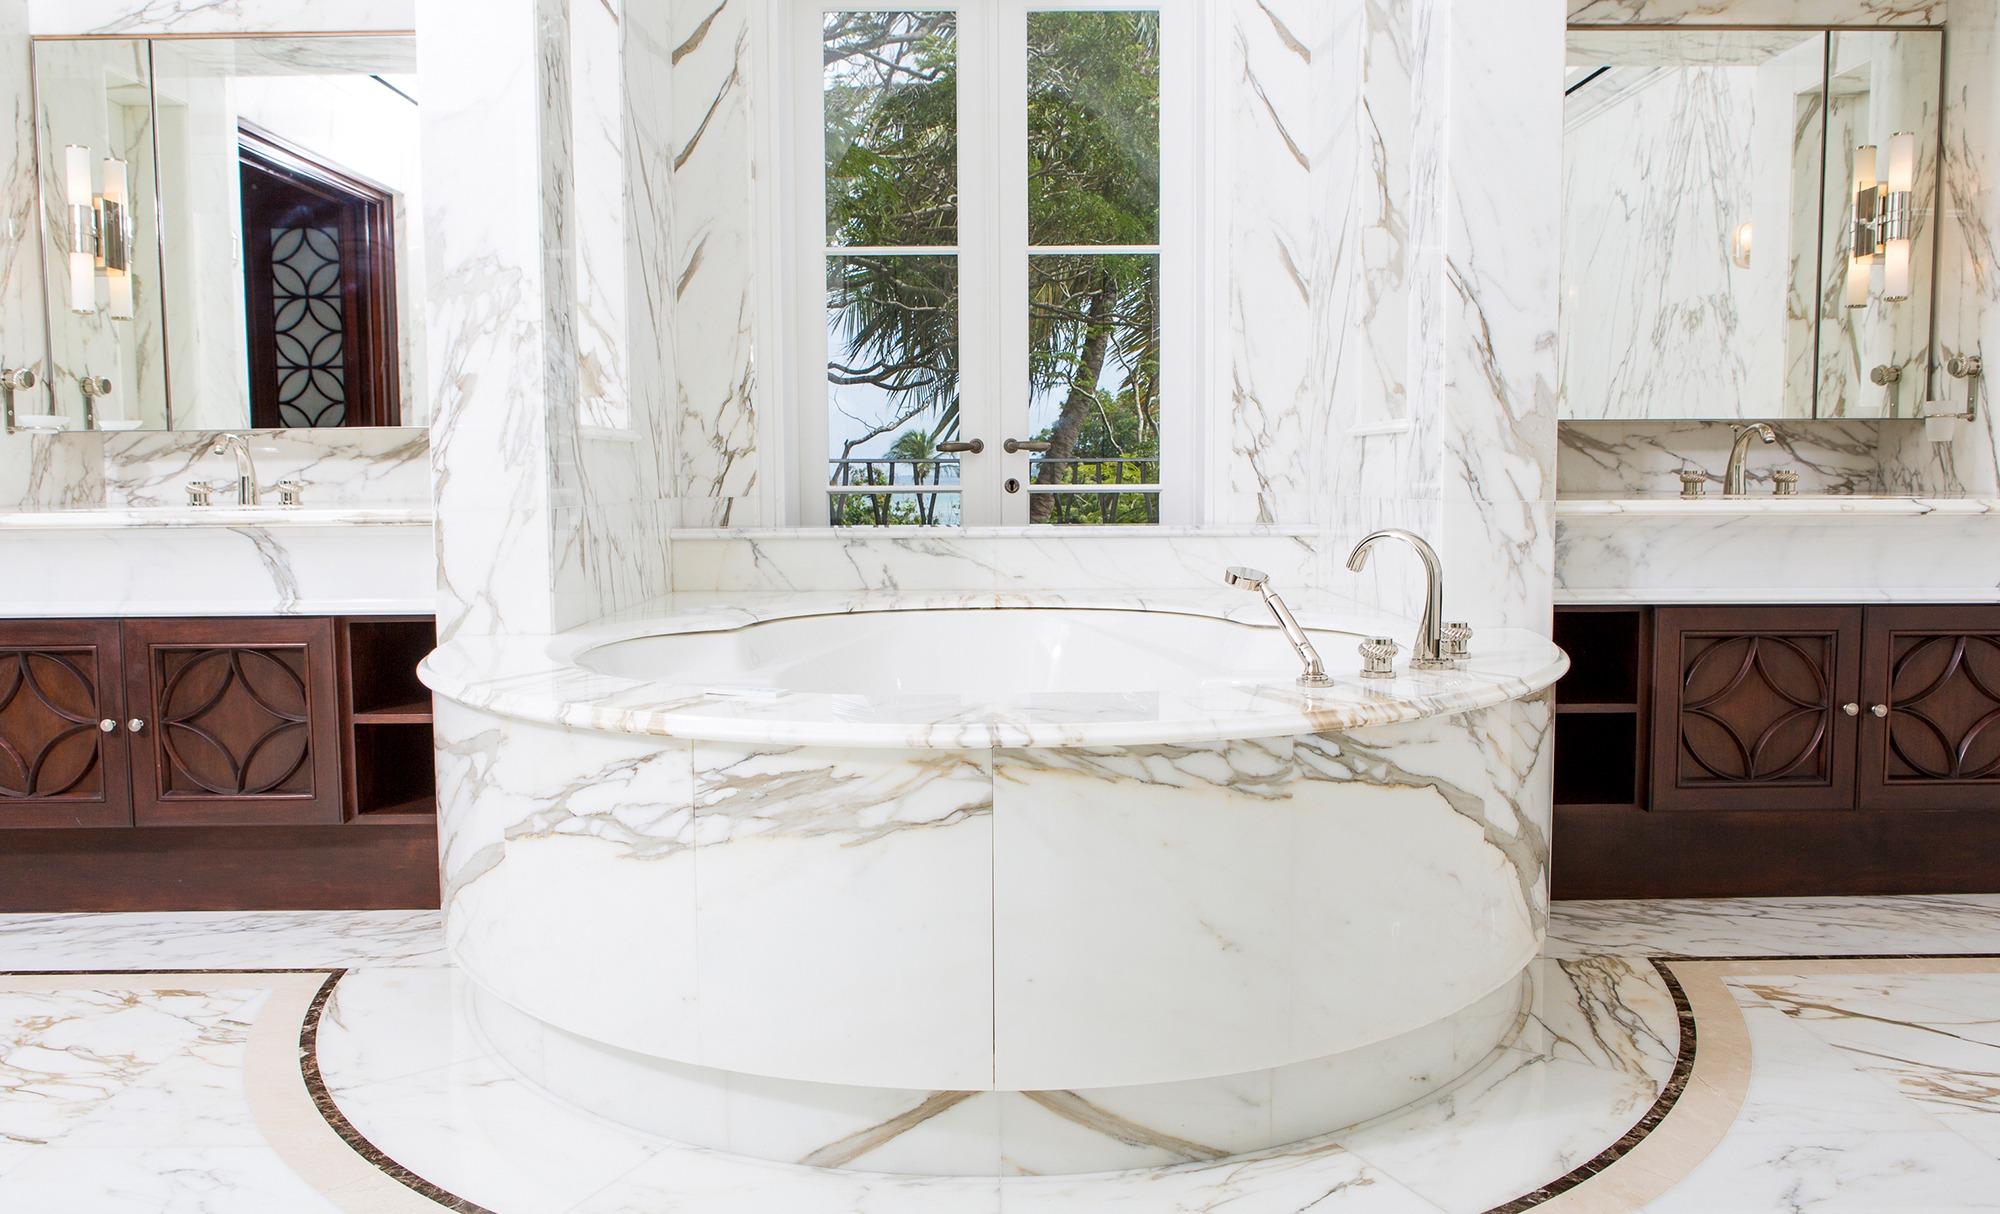 swimming pool, great view, mls, realestate, houseforsale, propertyforsale, home , homesforsale, housesforrent, luxury, barbados, beachfront, Ahavajerusalem, realtor, marble bathroom, outstanding design